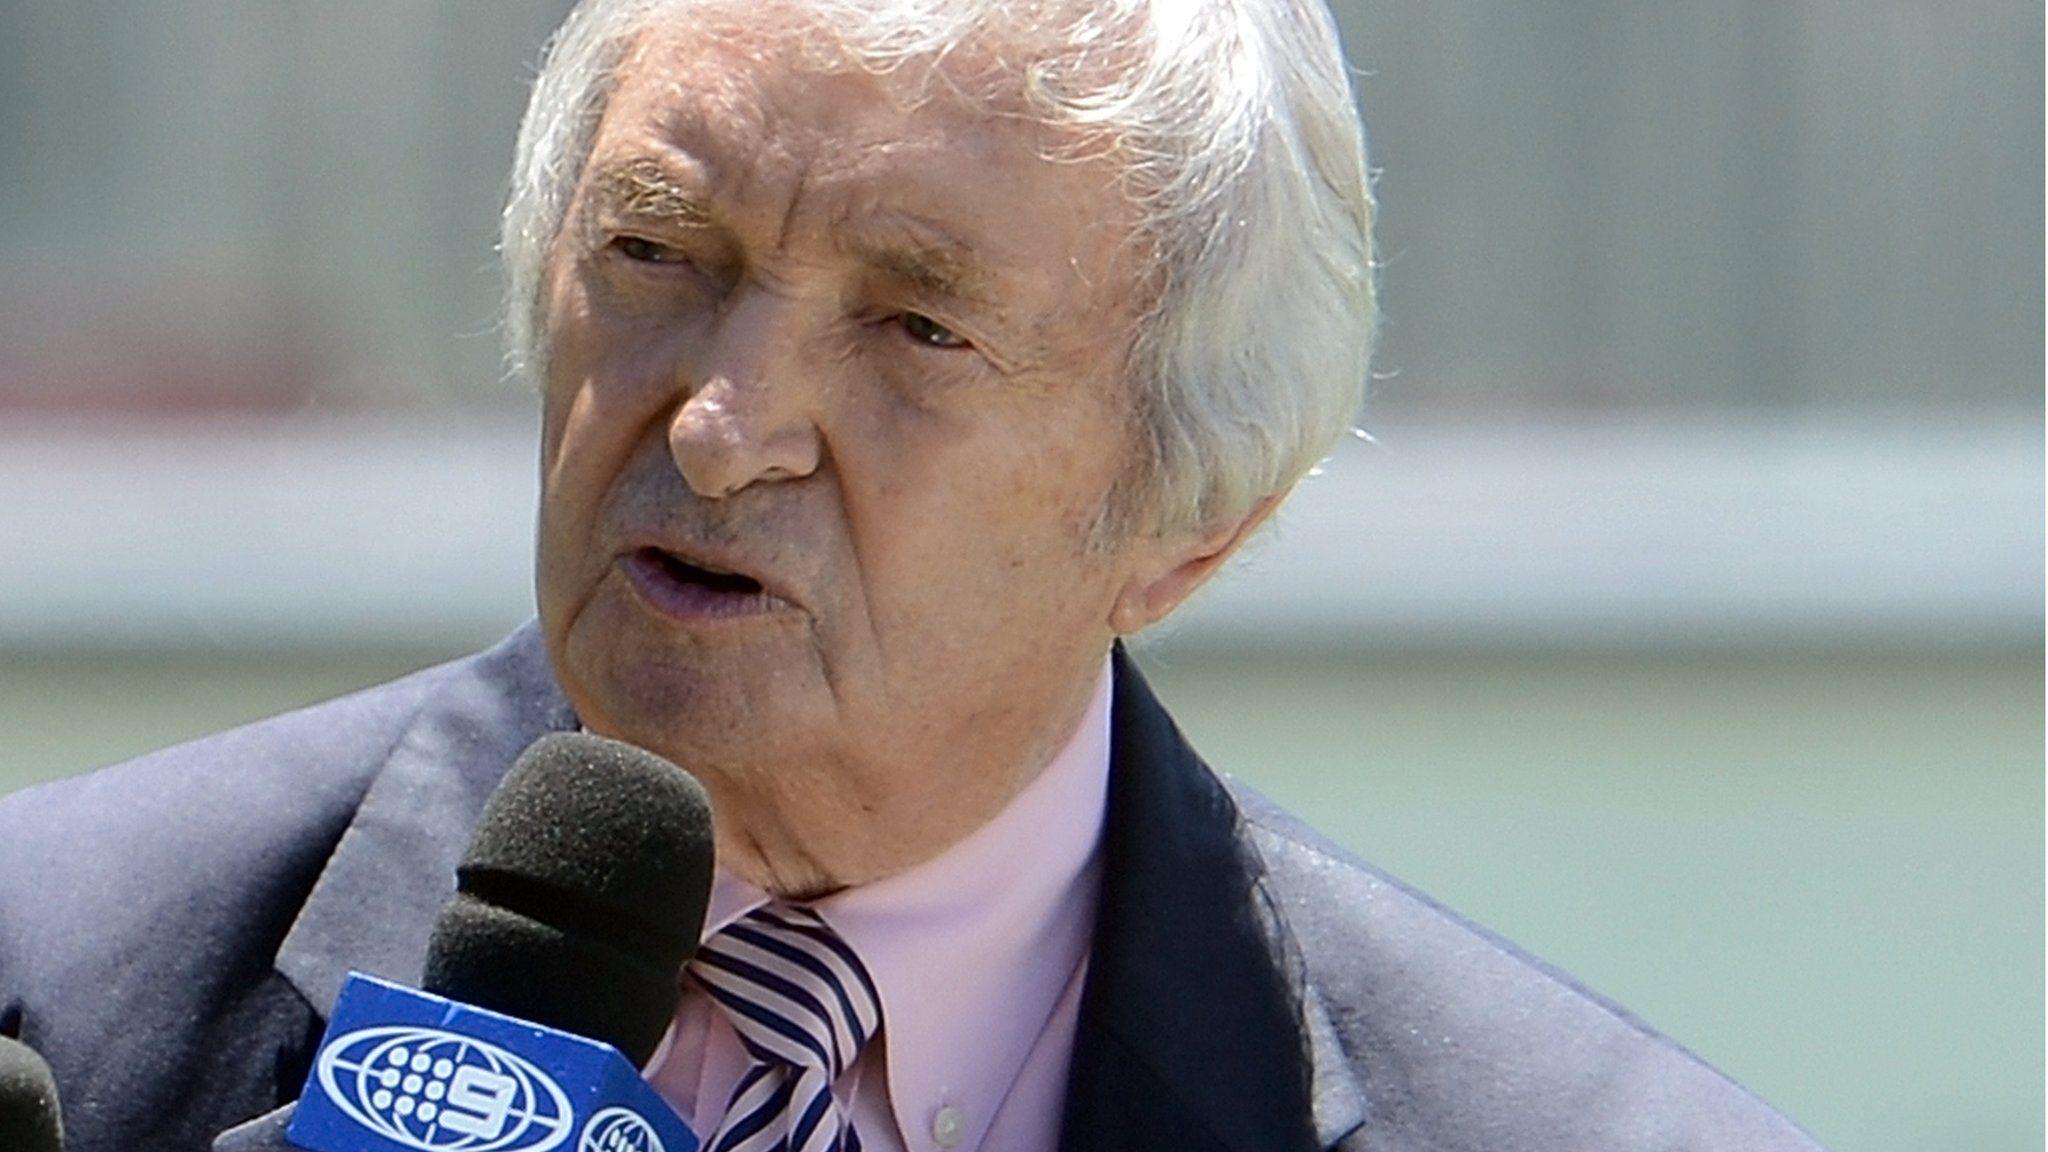 Richie Benaud World pays tribute to cricket legend